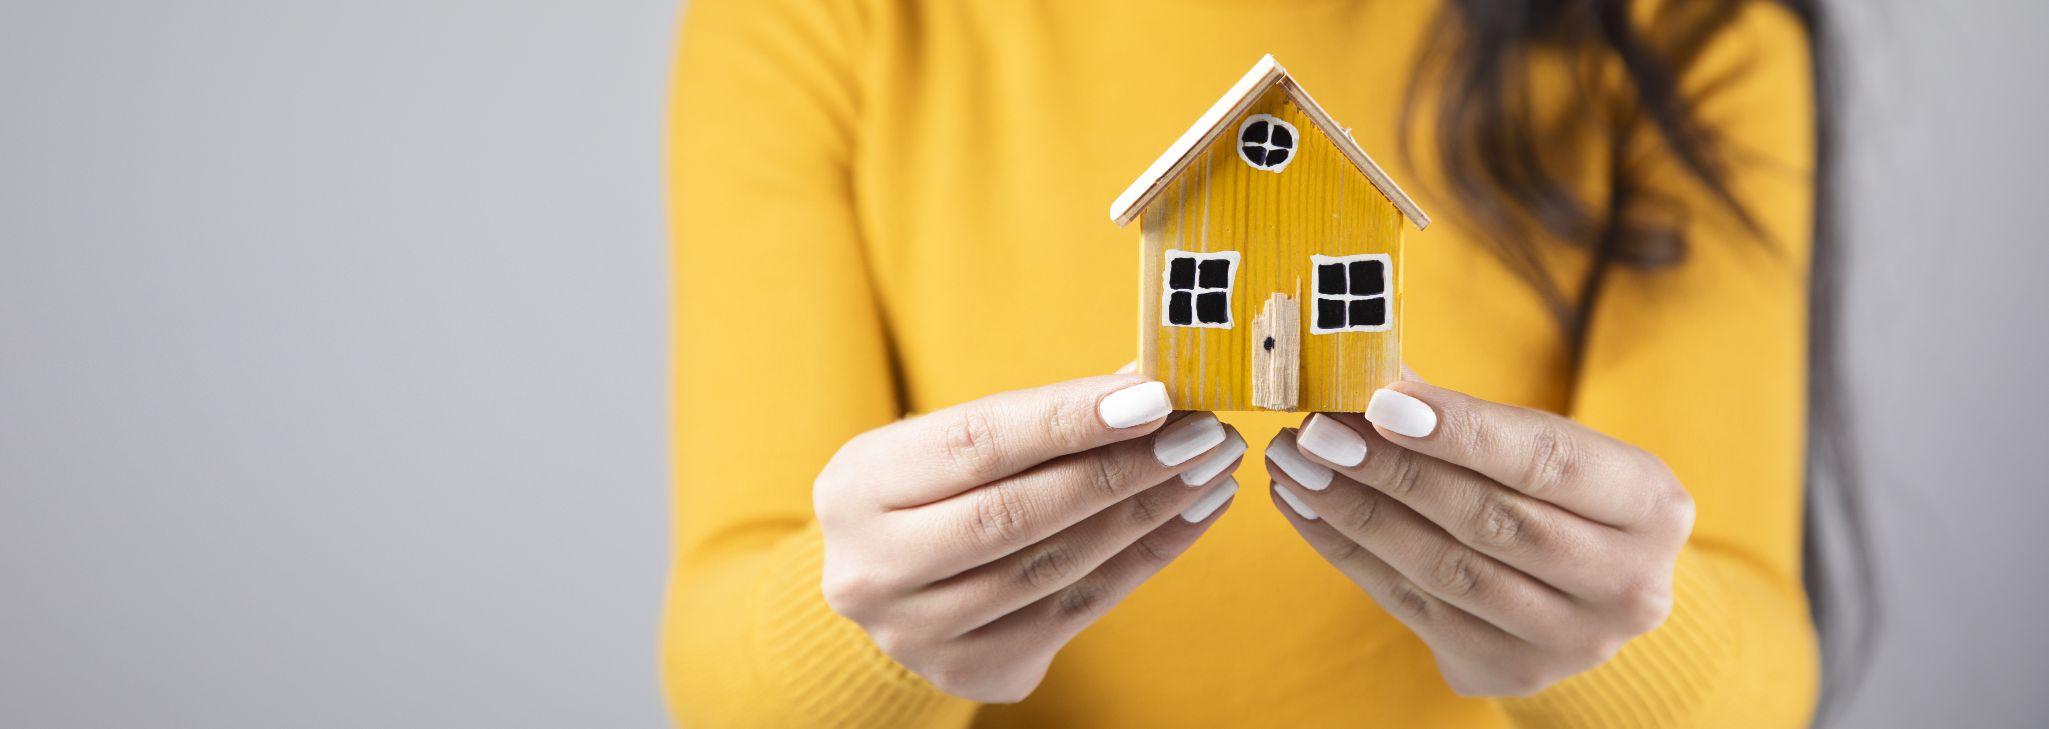 assurance habitation rimouski